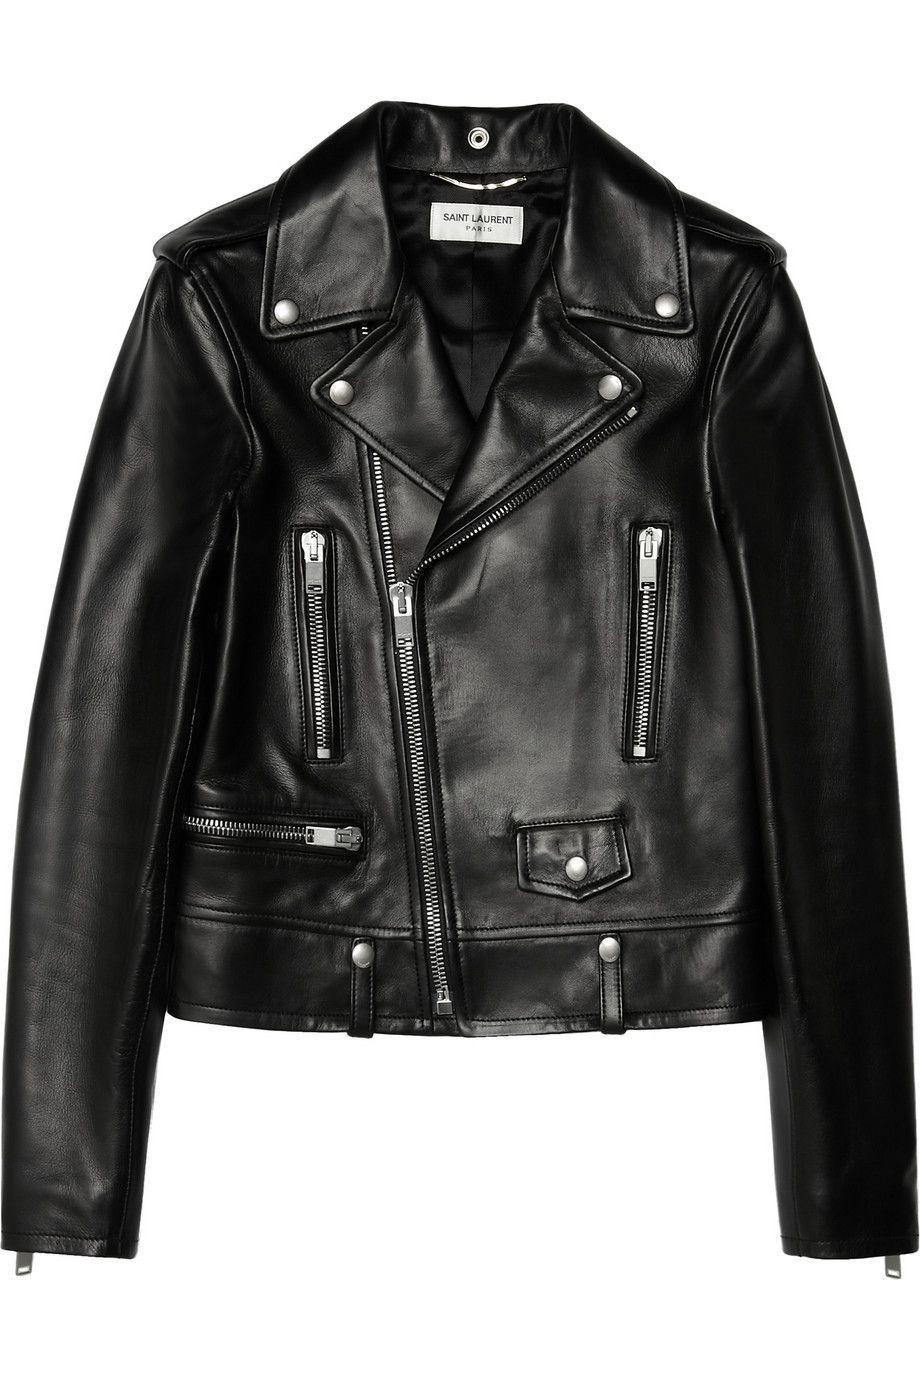 Saint Laurent Leather Biker Jacket As Seen On Rosie Huntington Whiteley